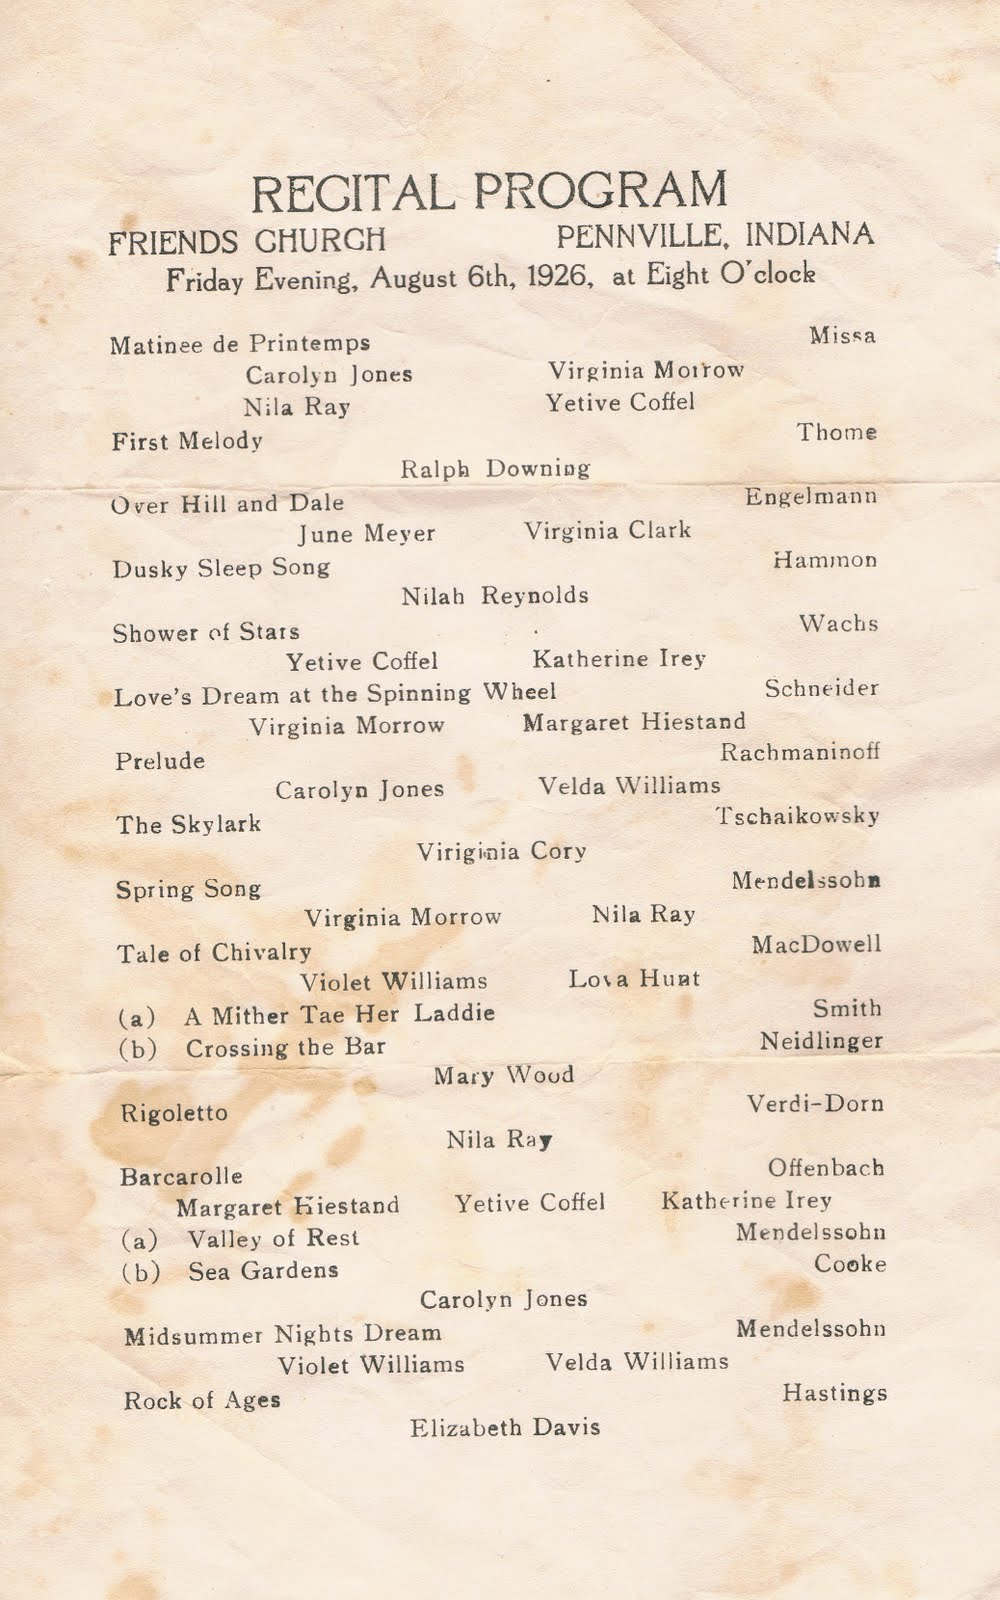 piano recital program template download